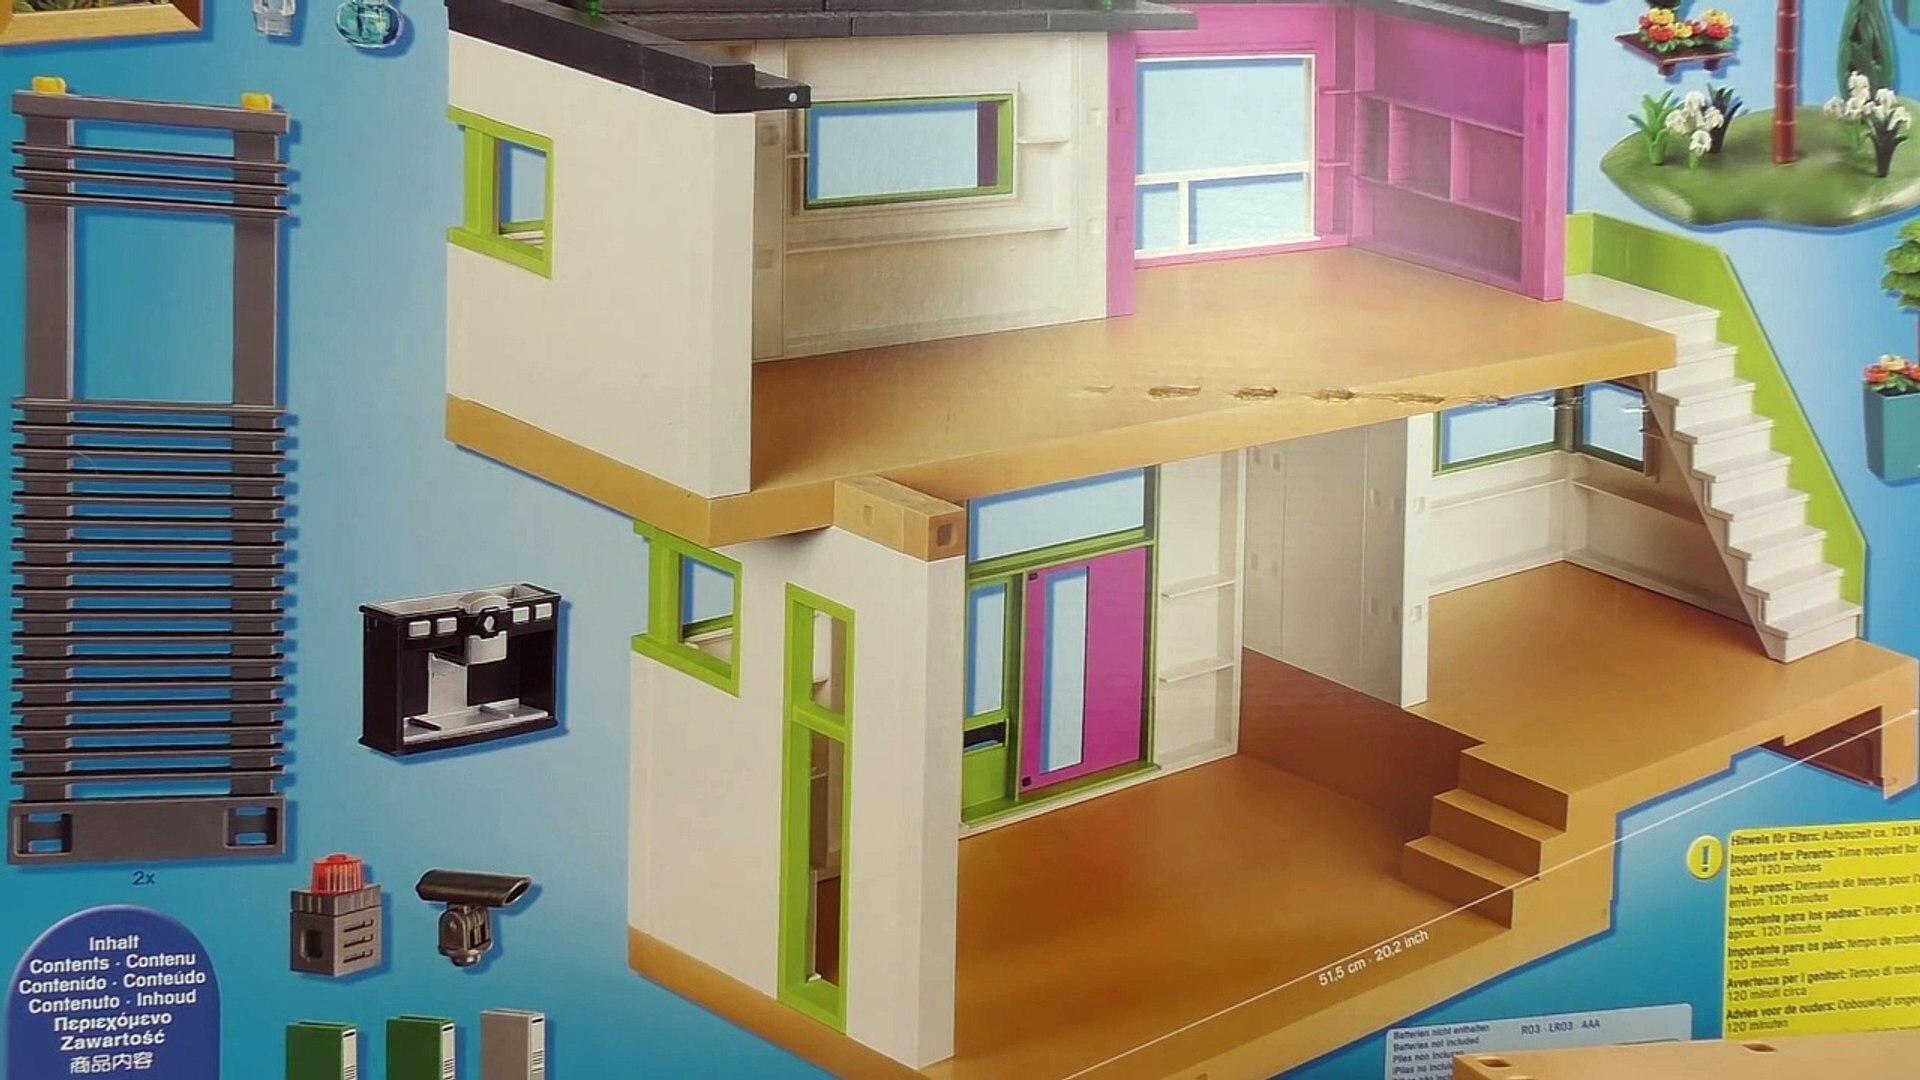 PLAYMOBIL 5579 - Kinderzimmer mit Hochbett-Rutsche PLAYMOBIL ...